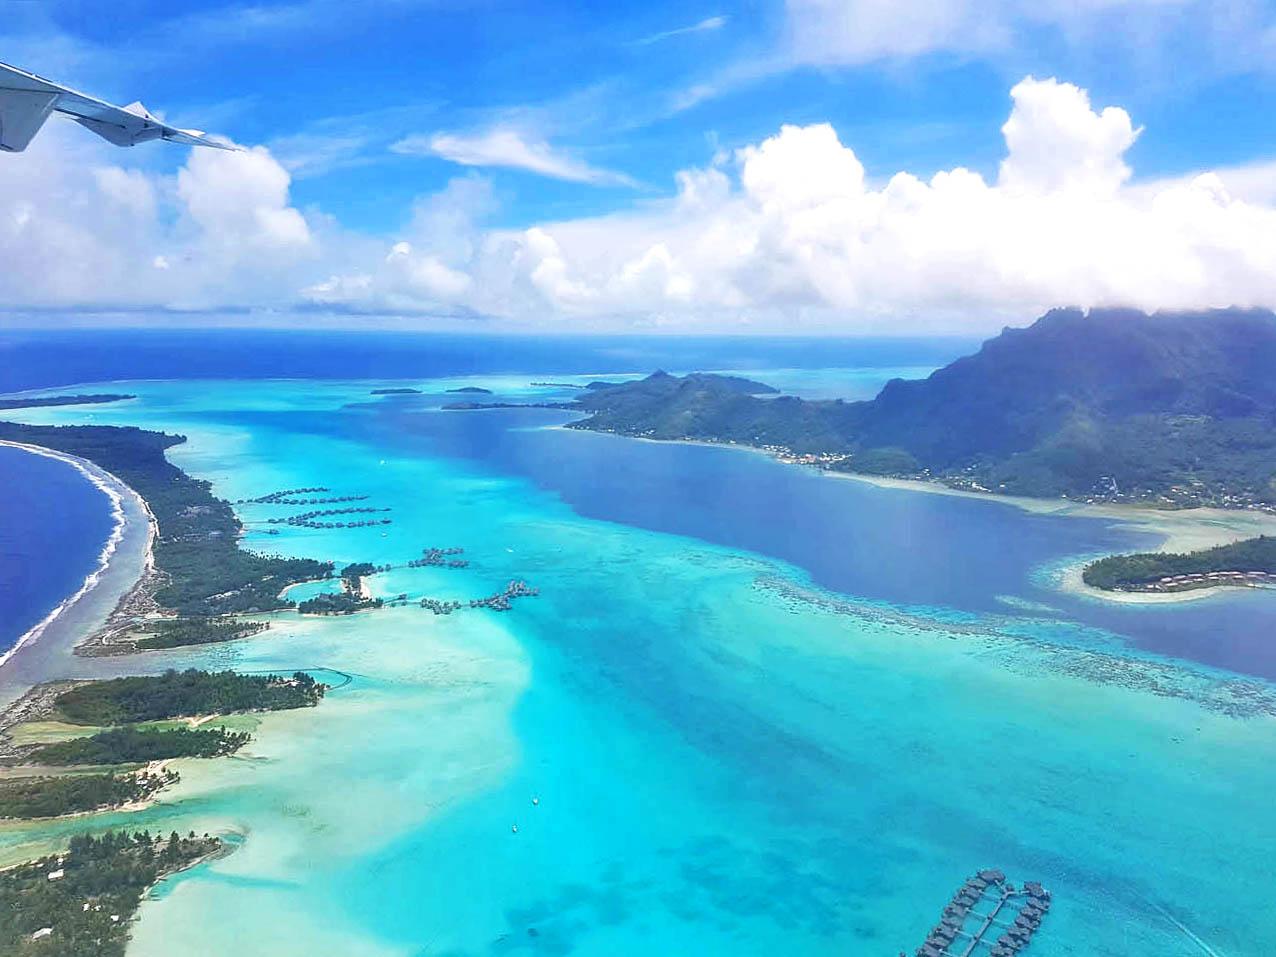 Vôo da Air Tahiti, de Taha'a para Papeete, passando por Bora Bora | foto: Lala Rebelo